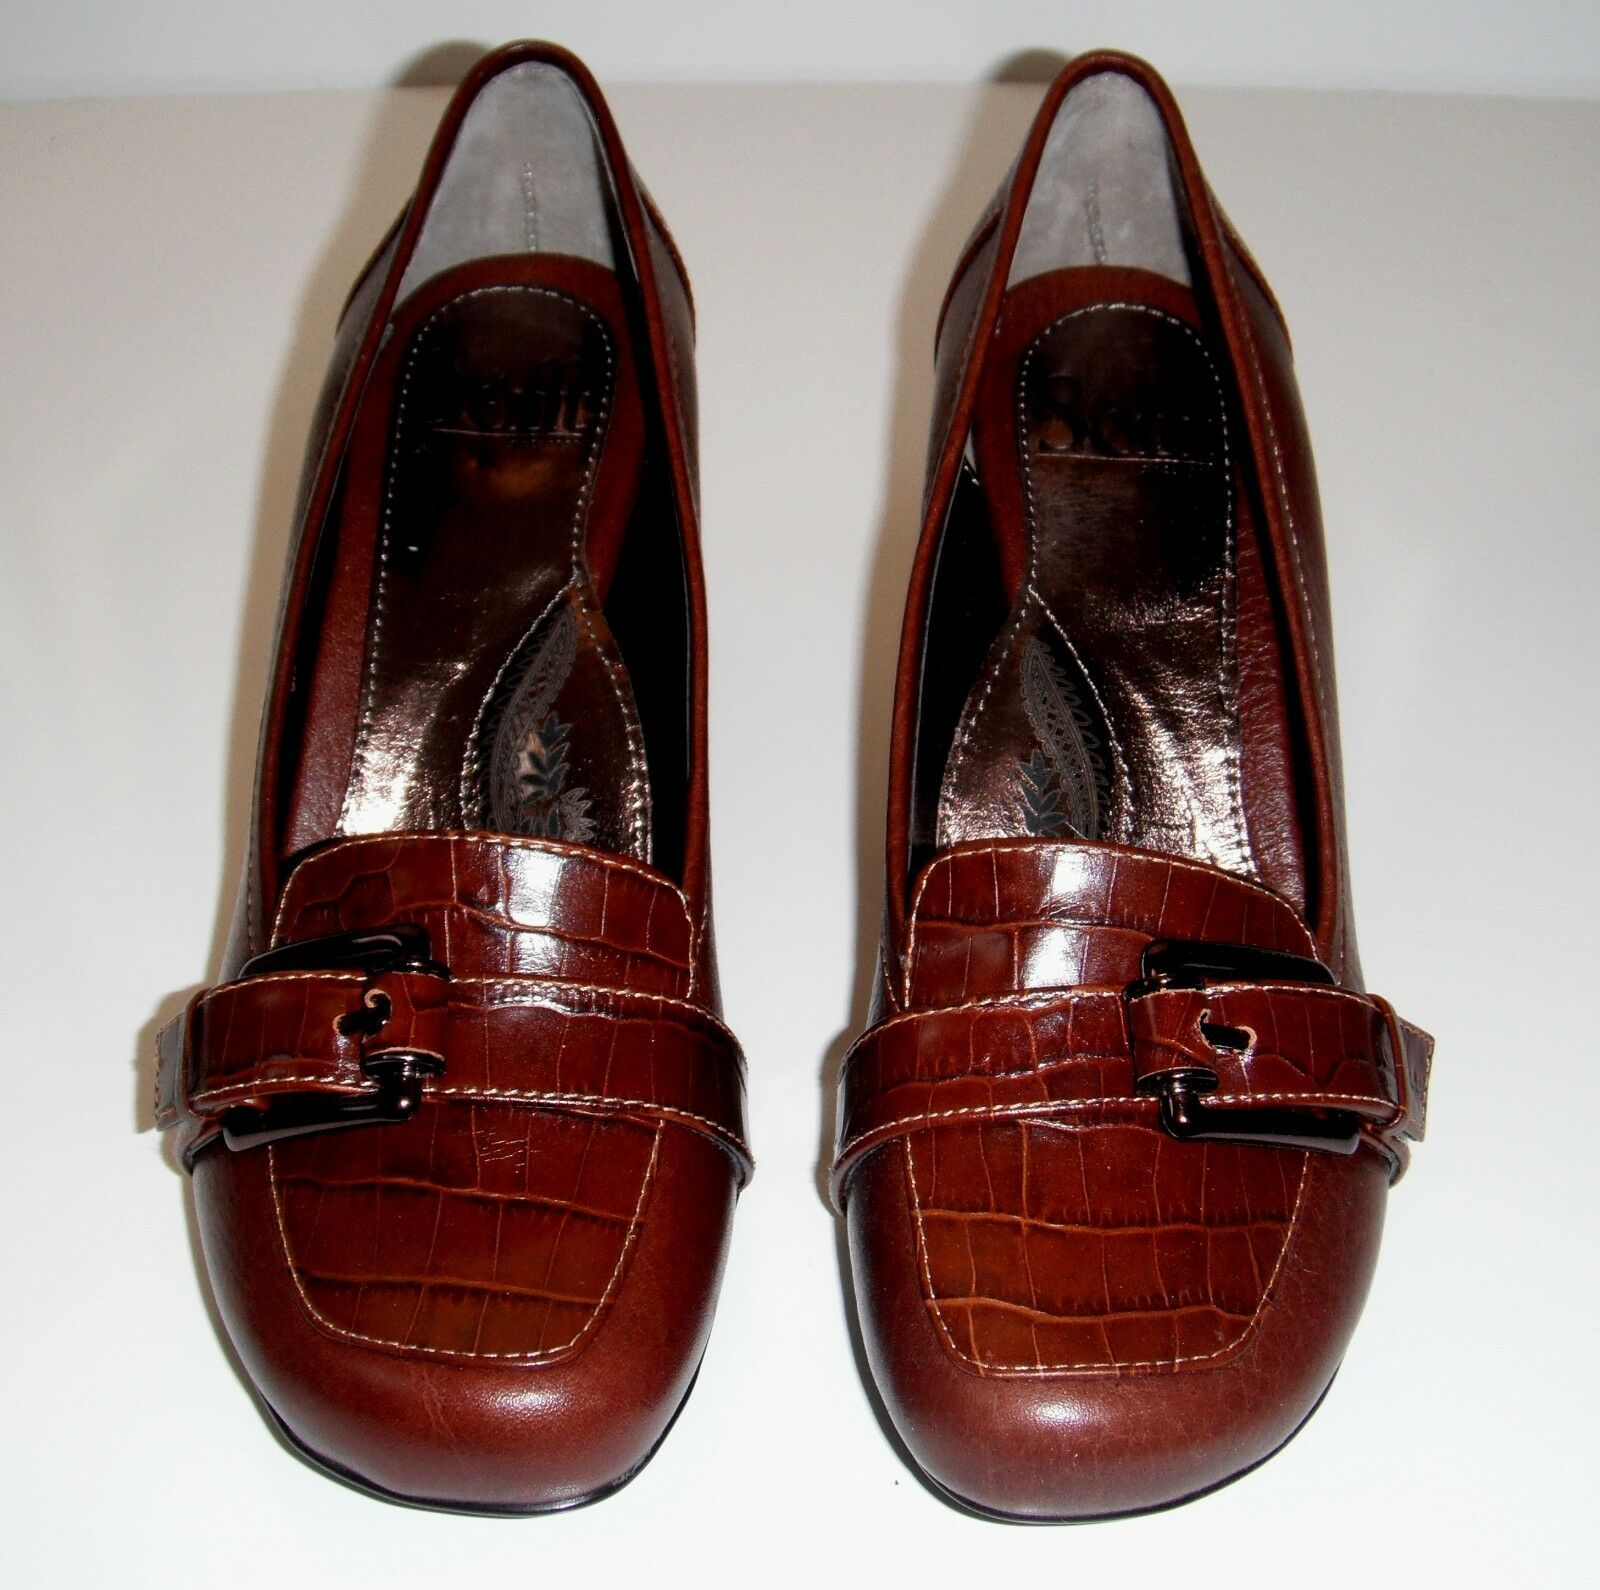 115 NIB Sofft Marilyn Dark Pine Braun Leder Classy Schuhe sz 8.5